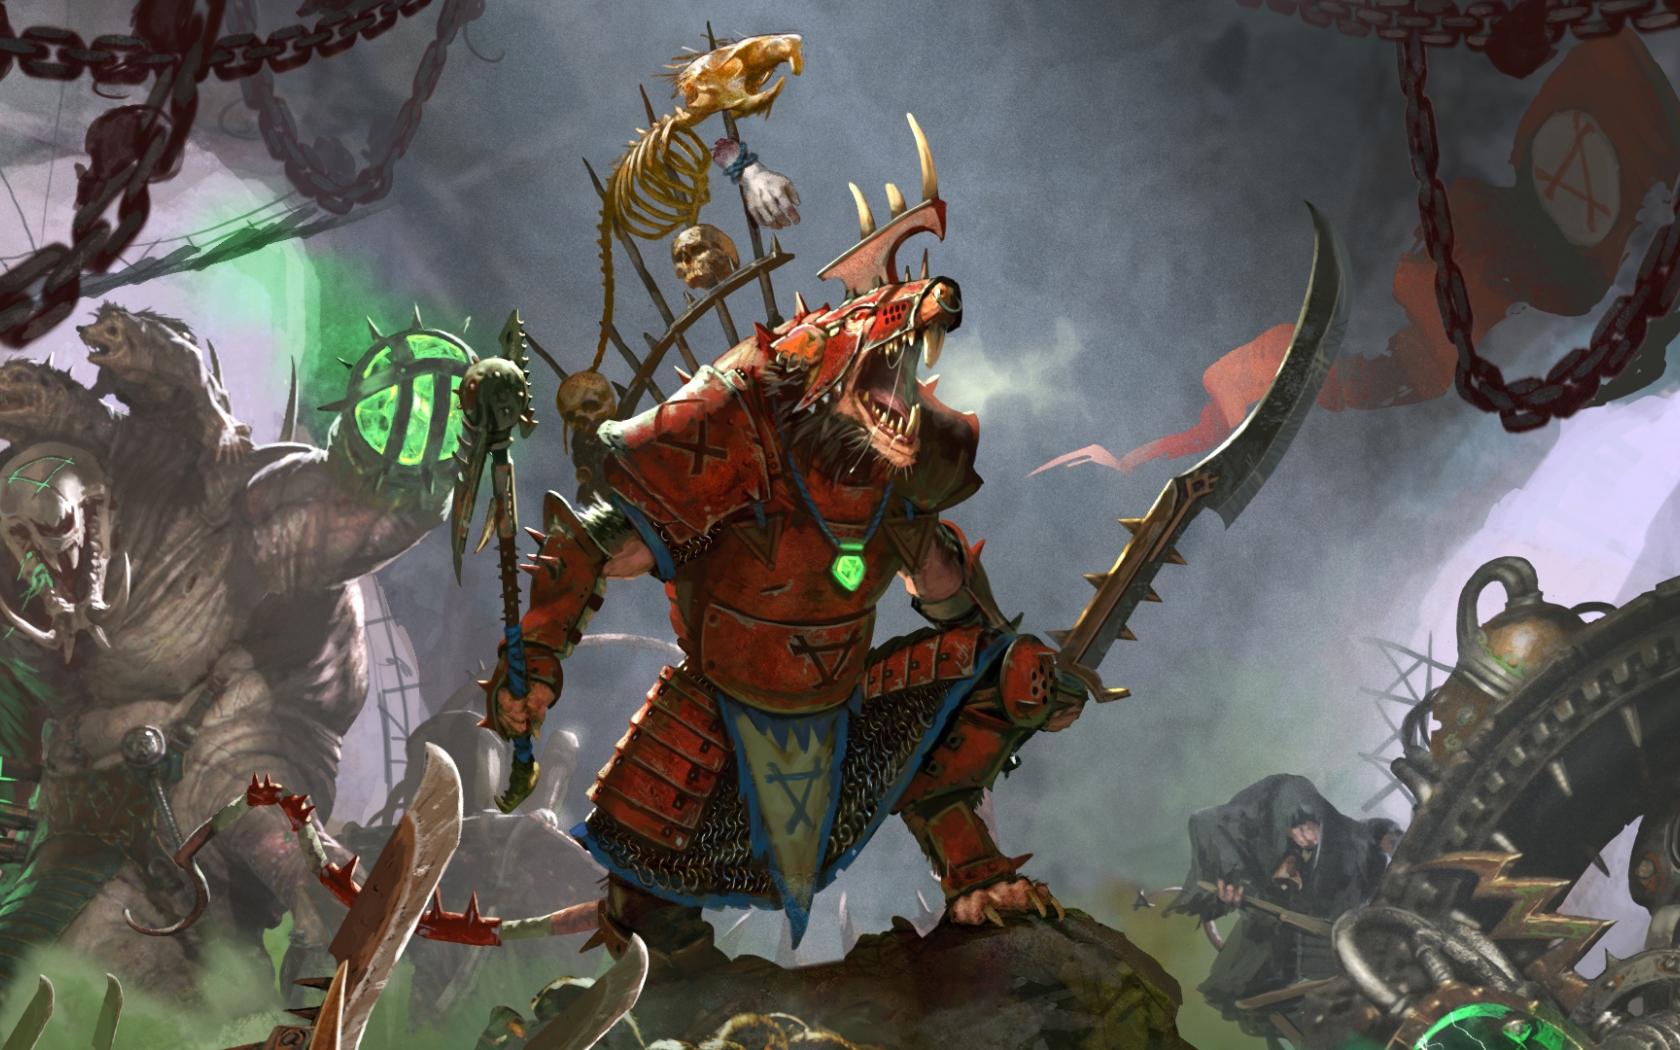 Free Download Total War Warhammer Ii Hd Wallpapers 34 Images